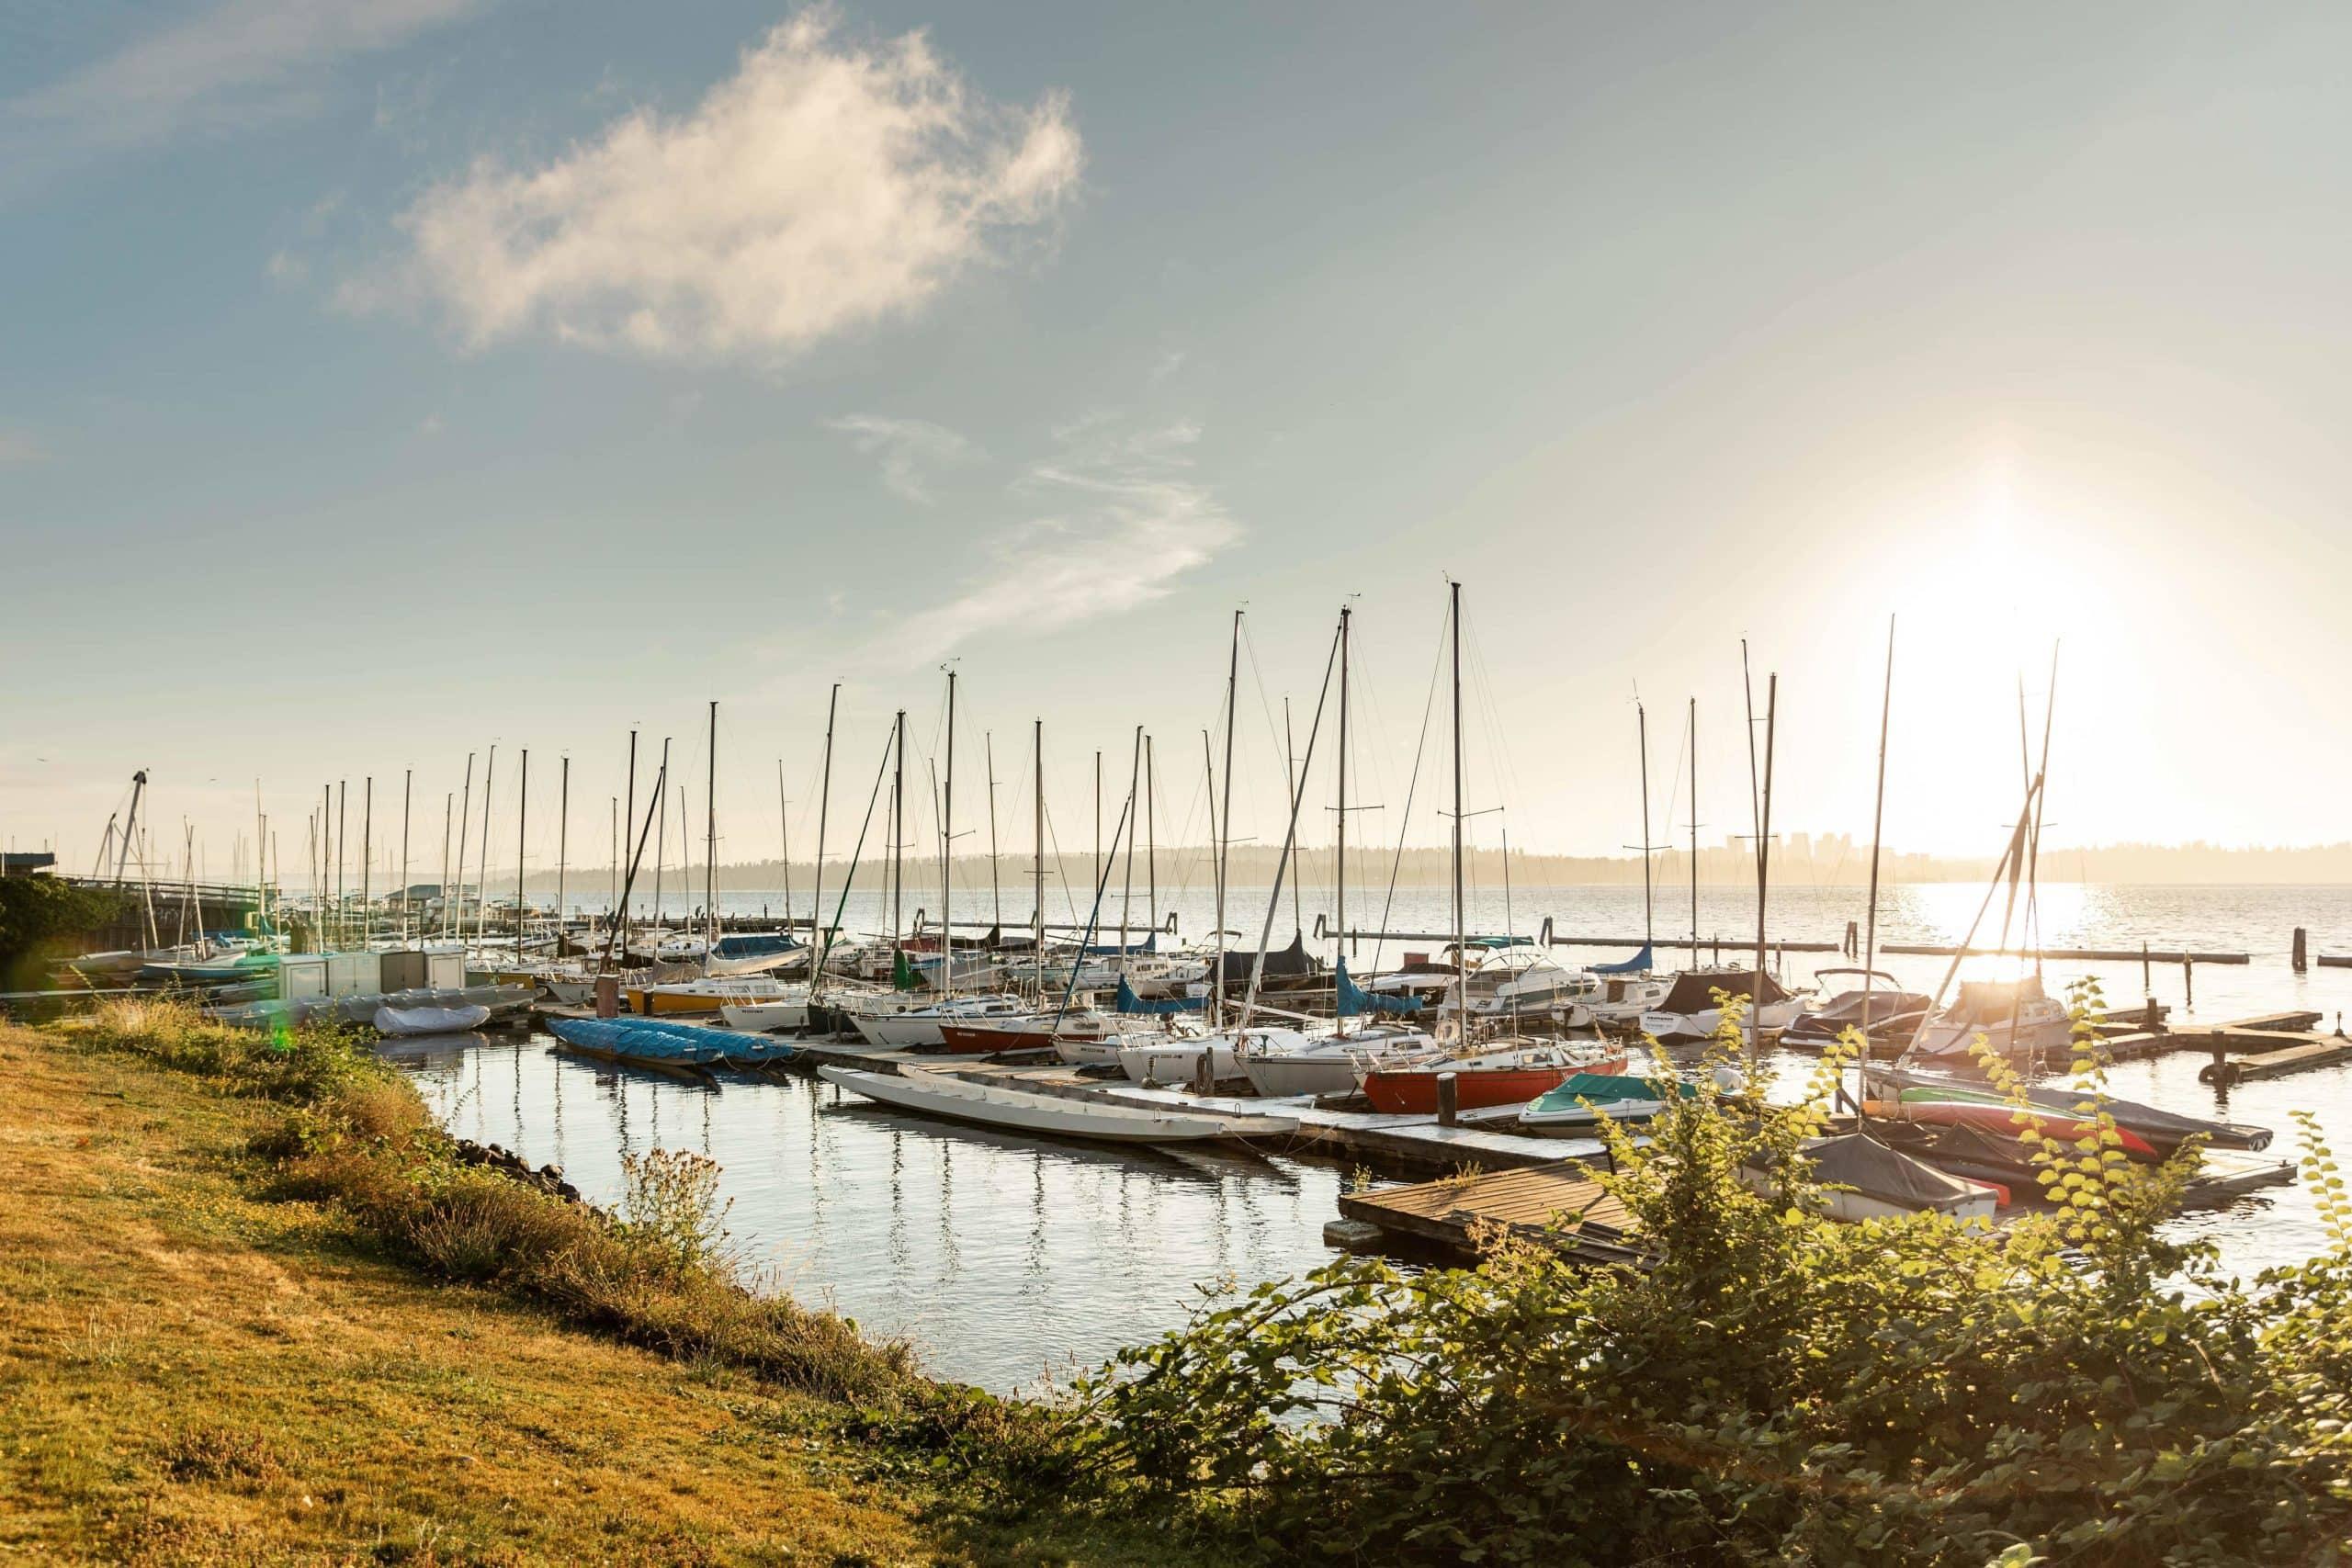 A marina on Lake Washington in Seattle's Leschi neighborhood